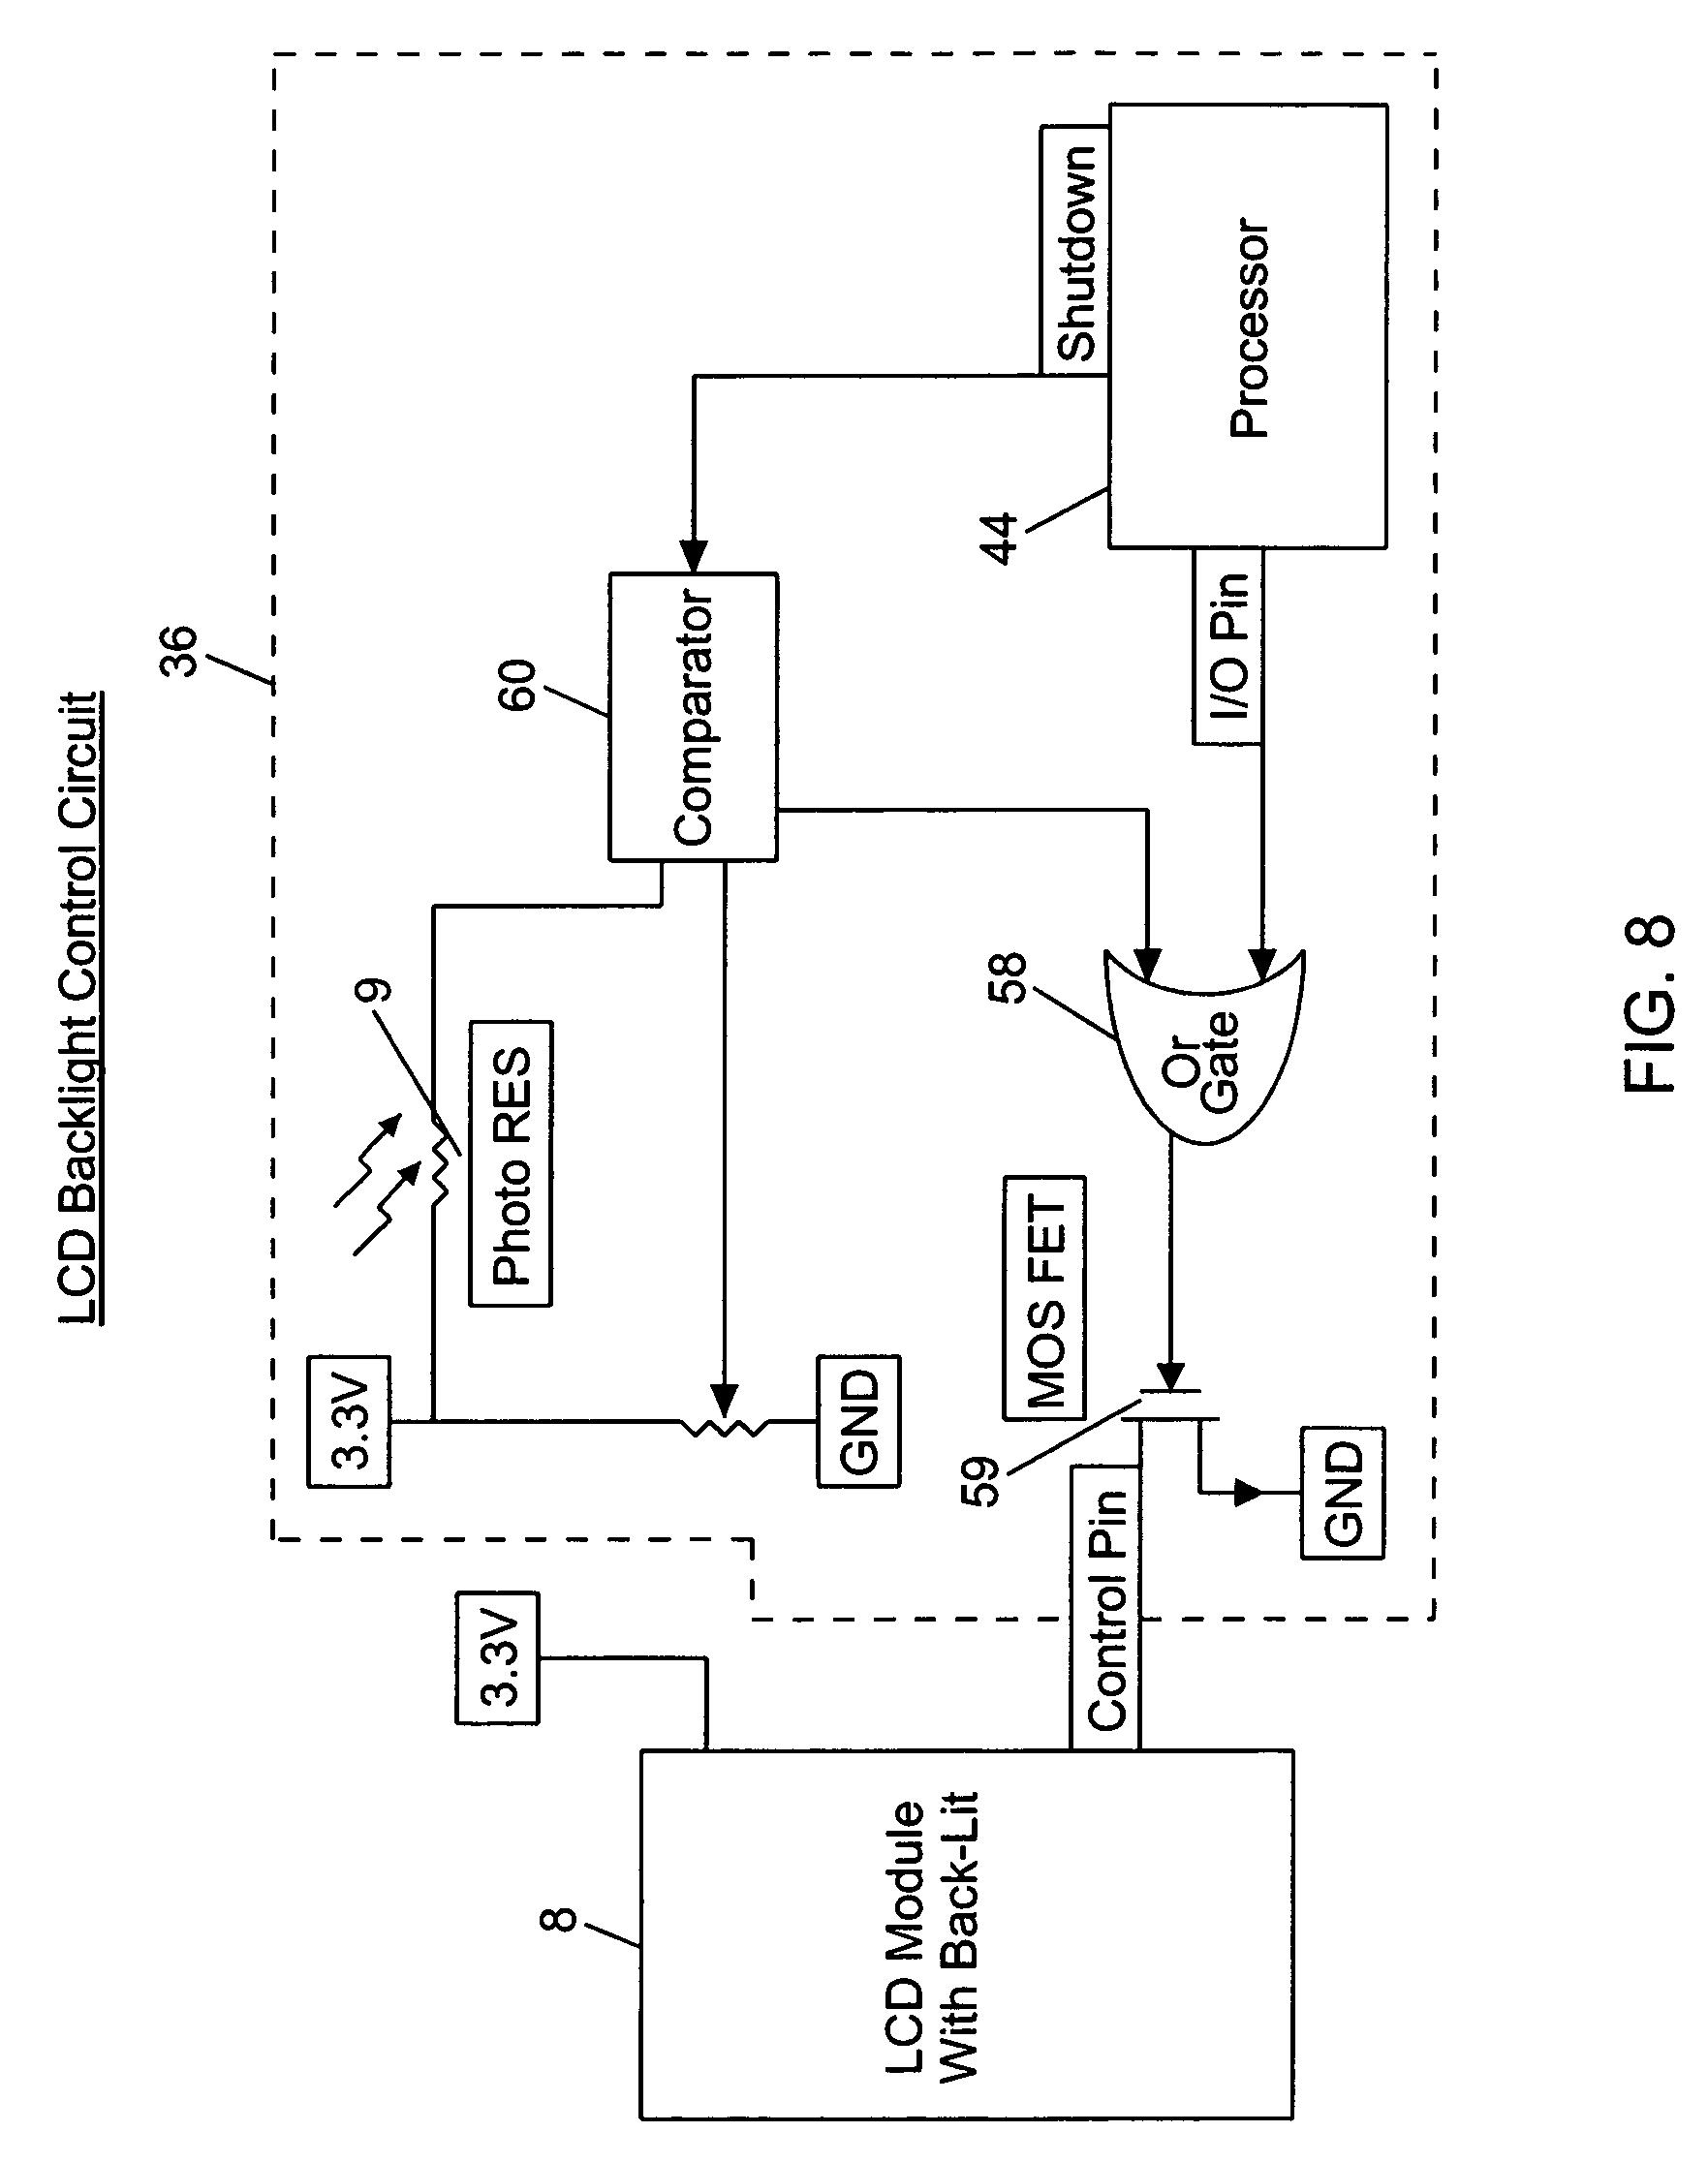 Patent Us 7121468 B2 Vz Fog Light Wiring Diagram Images